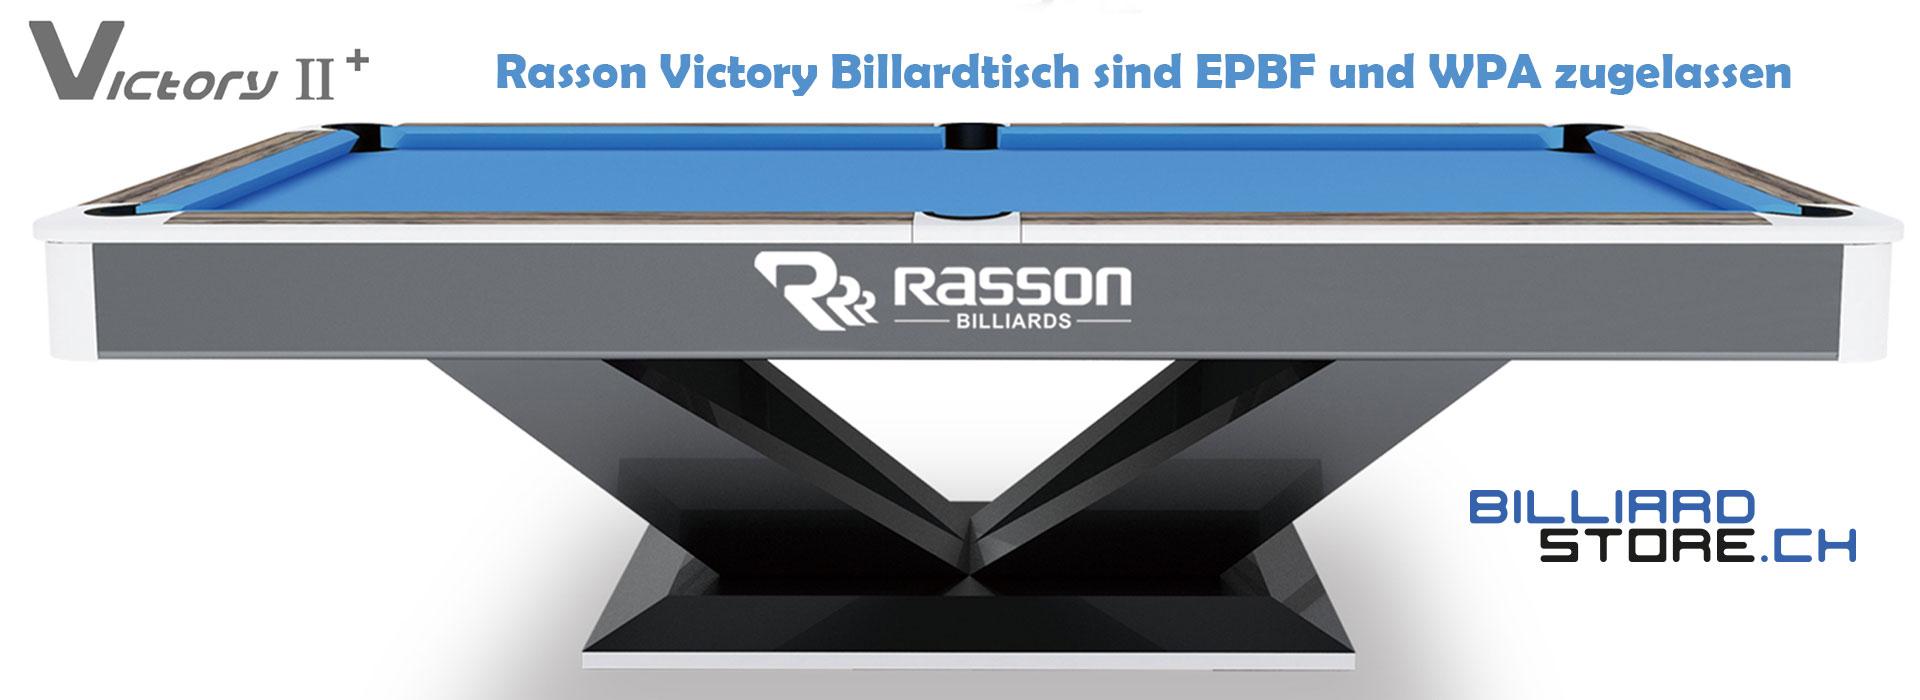 Victory Rasson